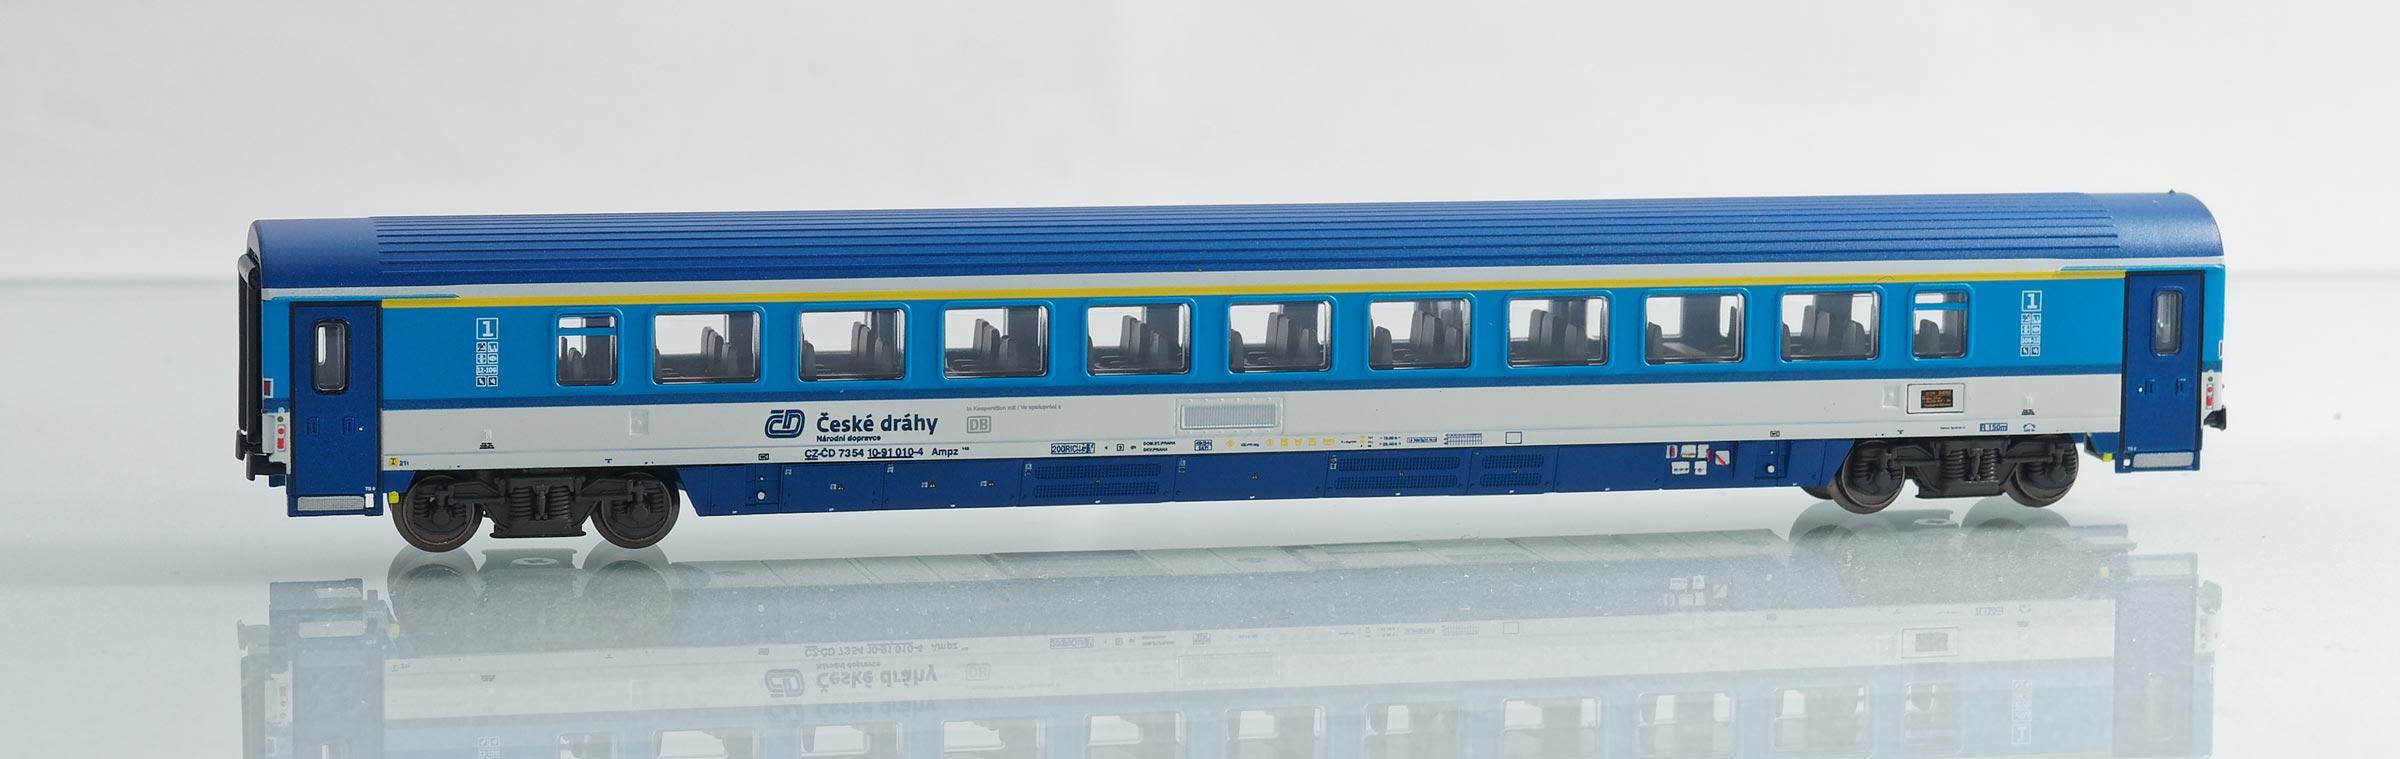 195452: EuroCity-Großraumwagen 1. Klasse, Bauart Ampz 143 der Tschechischen Eisenbahnen ČD